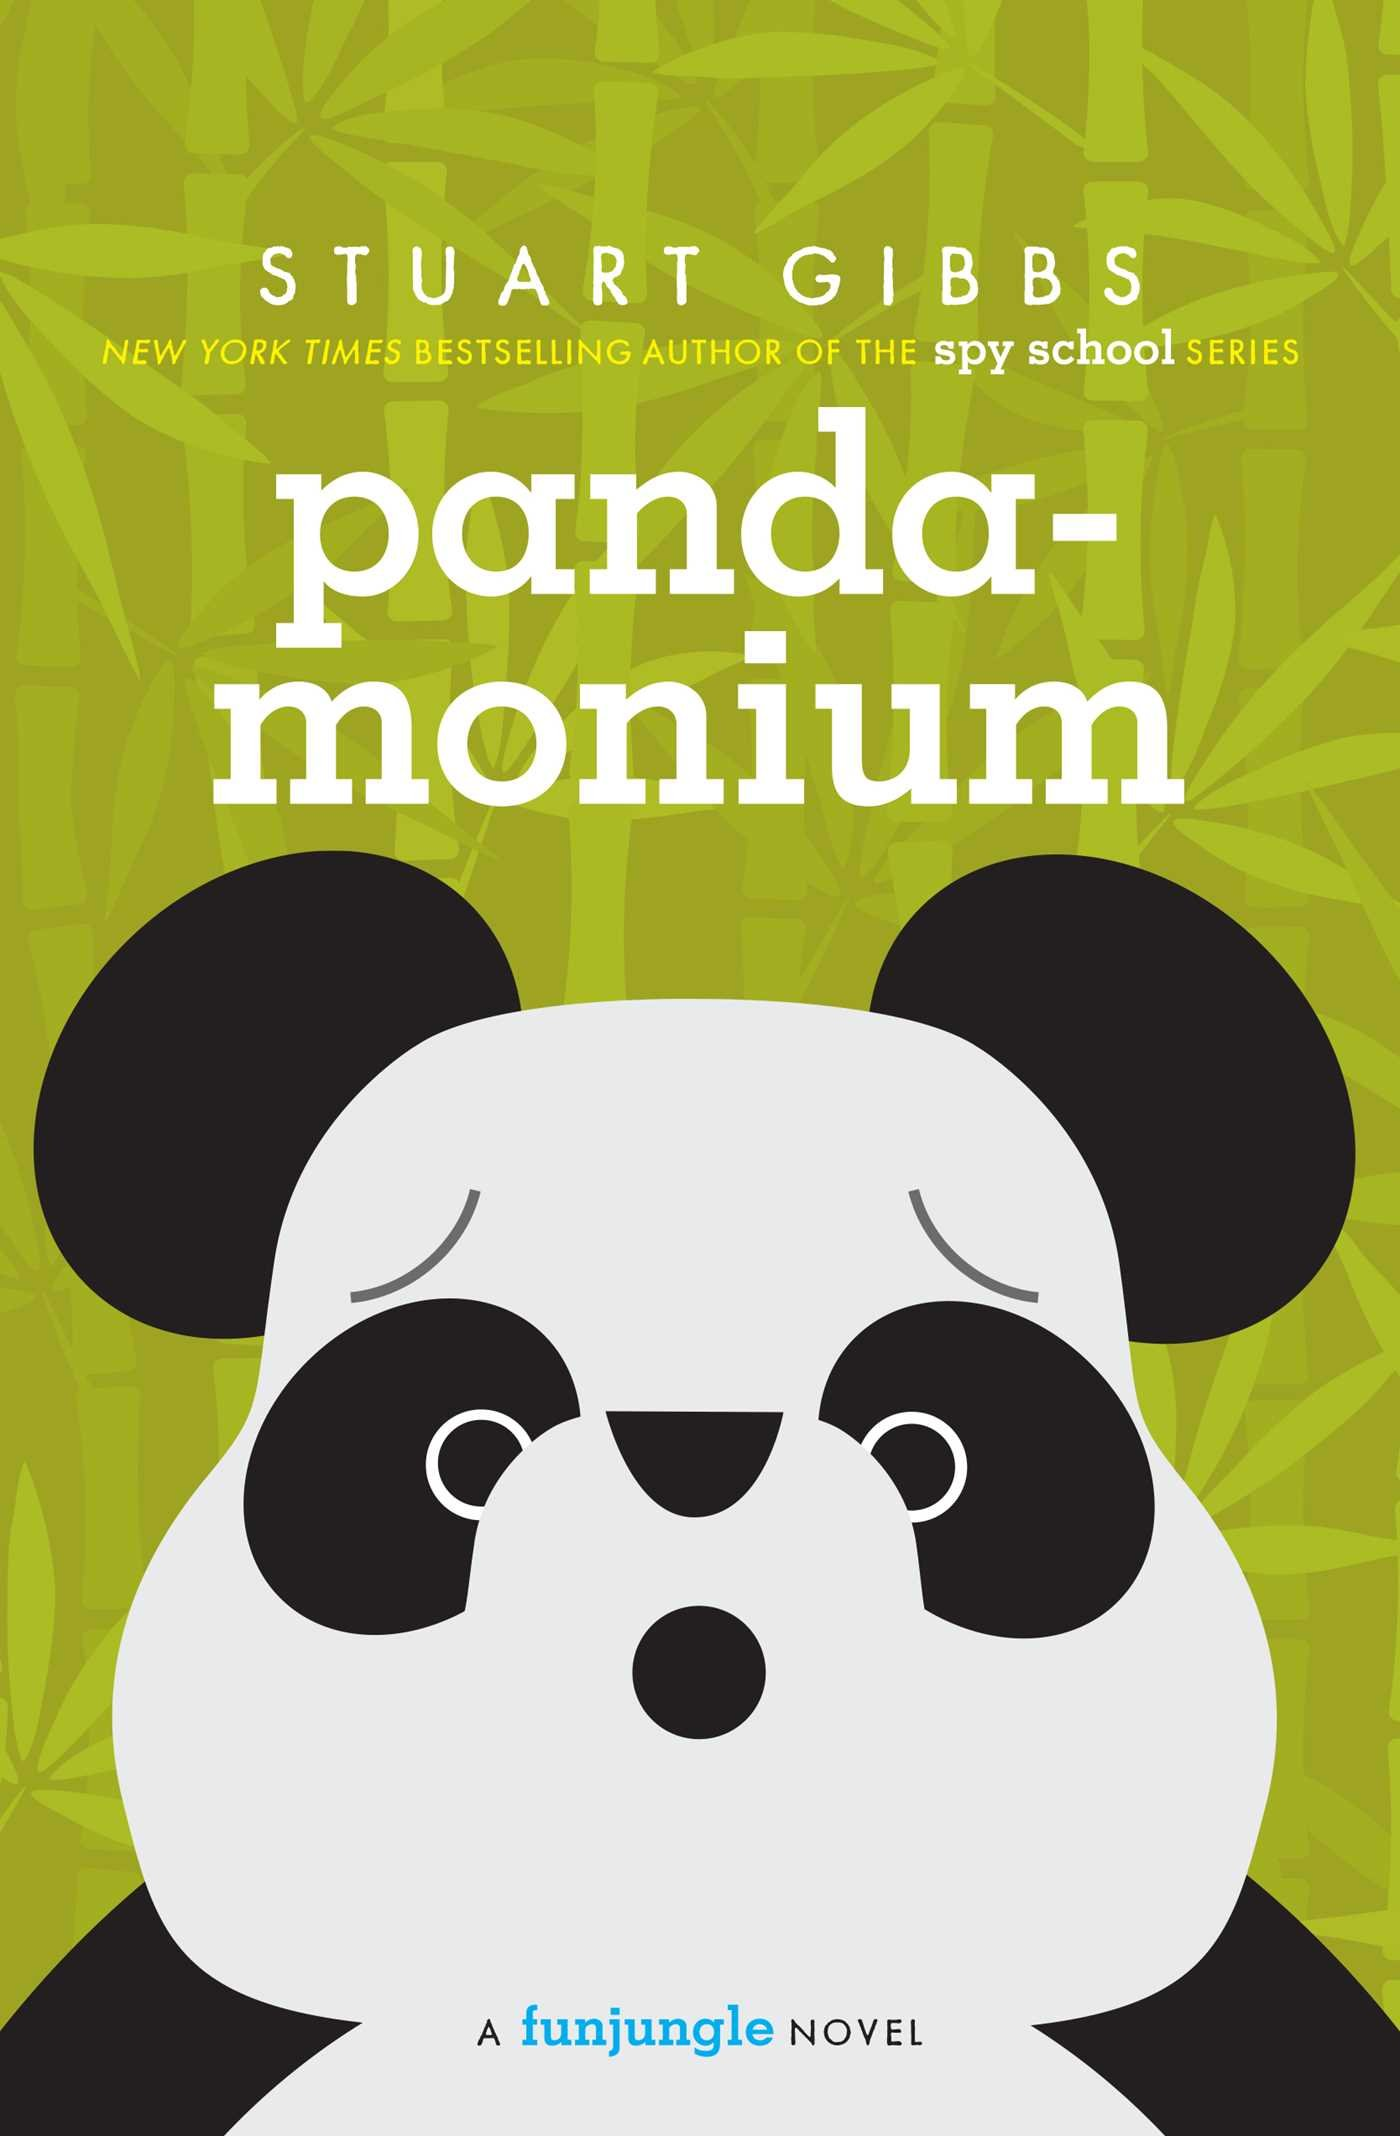 Read Online Panda-monium (FunJungle) pdf epub